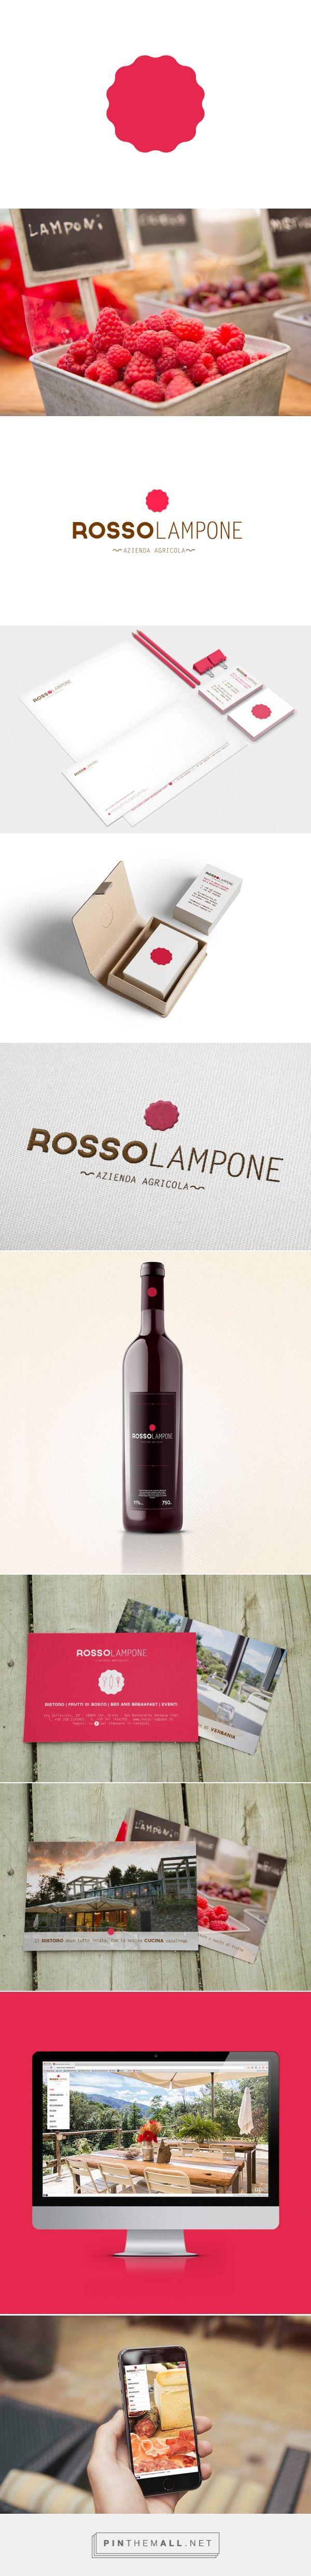 Rossolampone - Identity, Brand Identity, Web site, Design | Jam Area